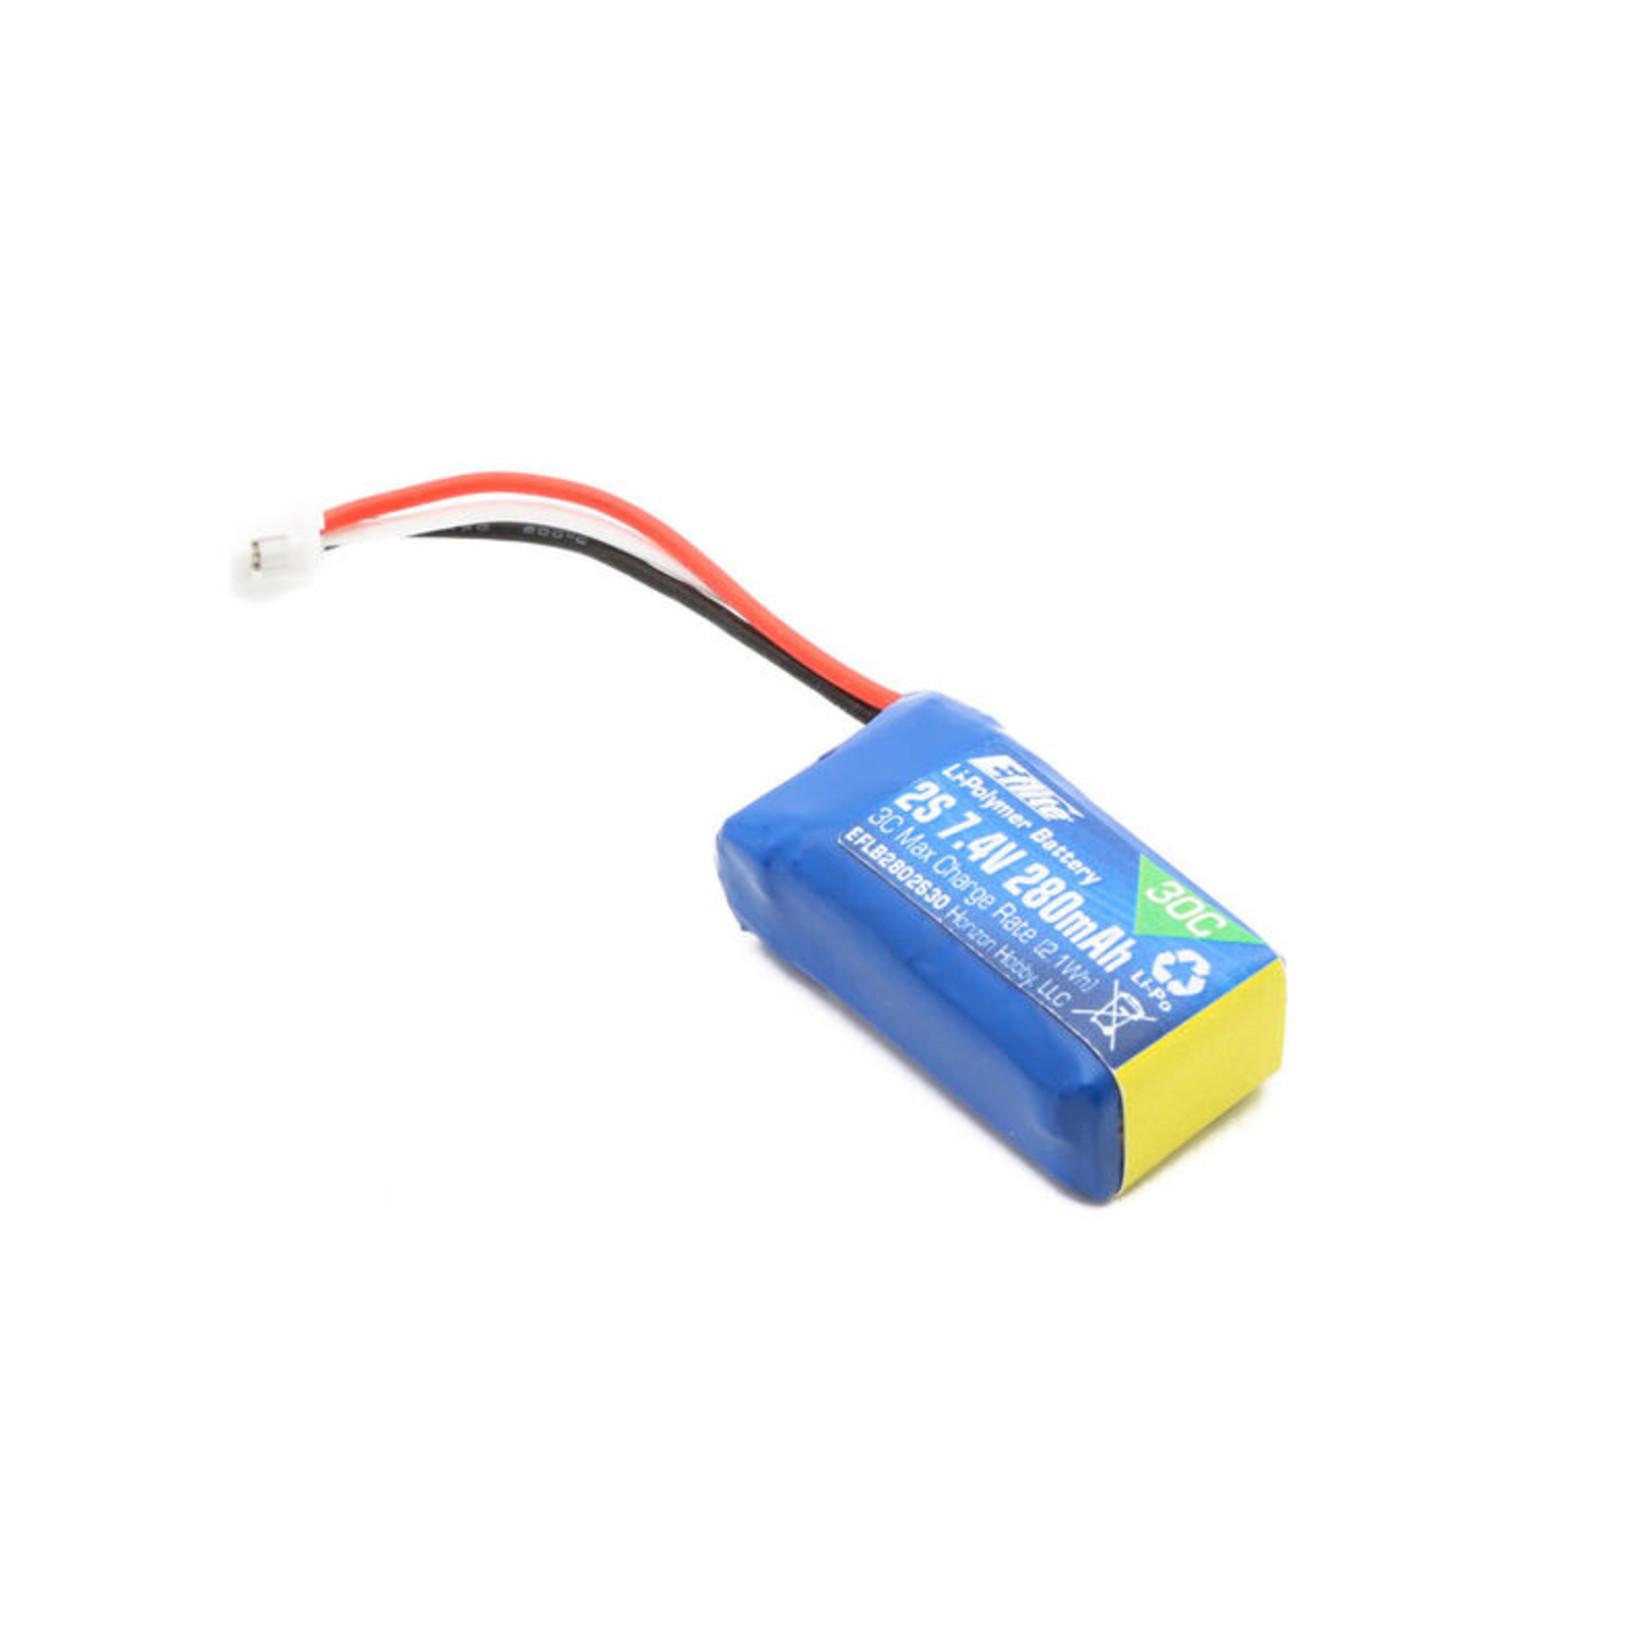 E-Flite EFLB2802S30 E-Flite 280mAh 2S 7.4V 30C Li-Po Battery